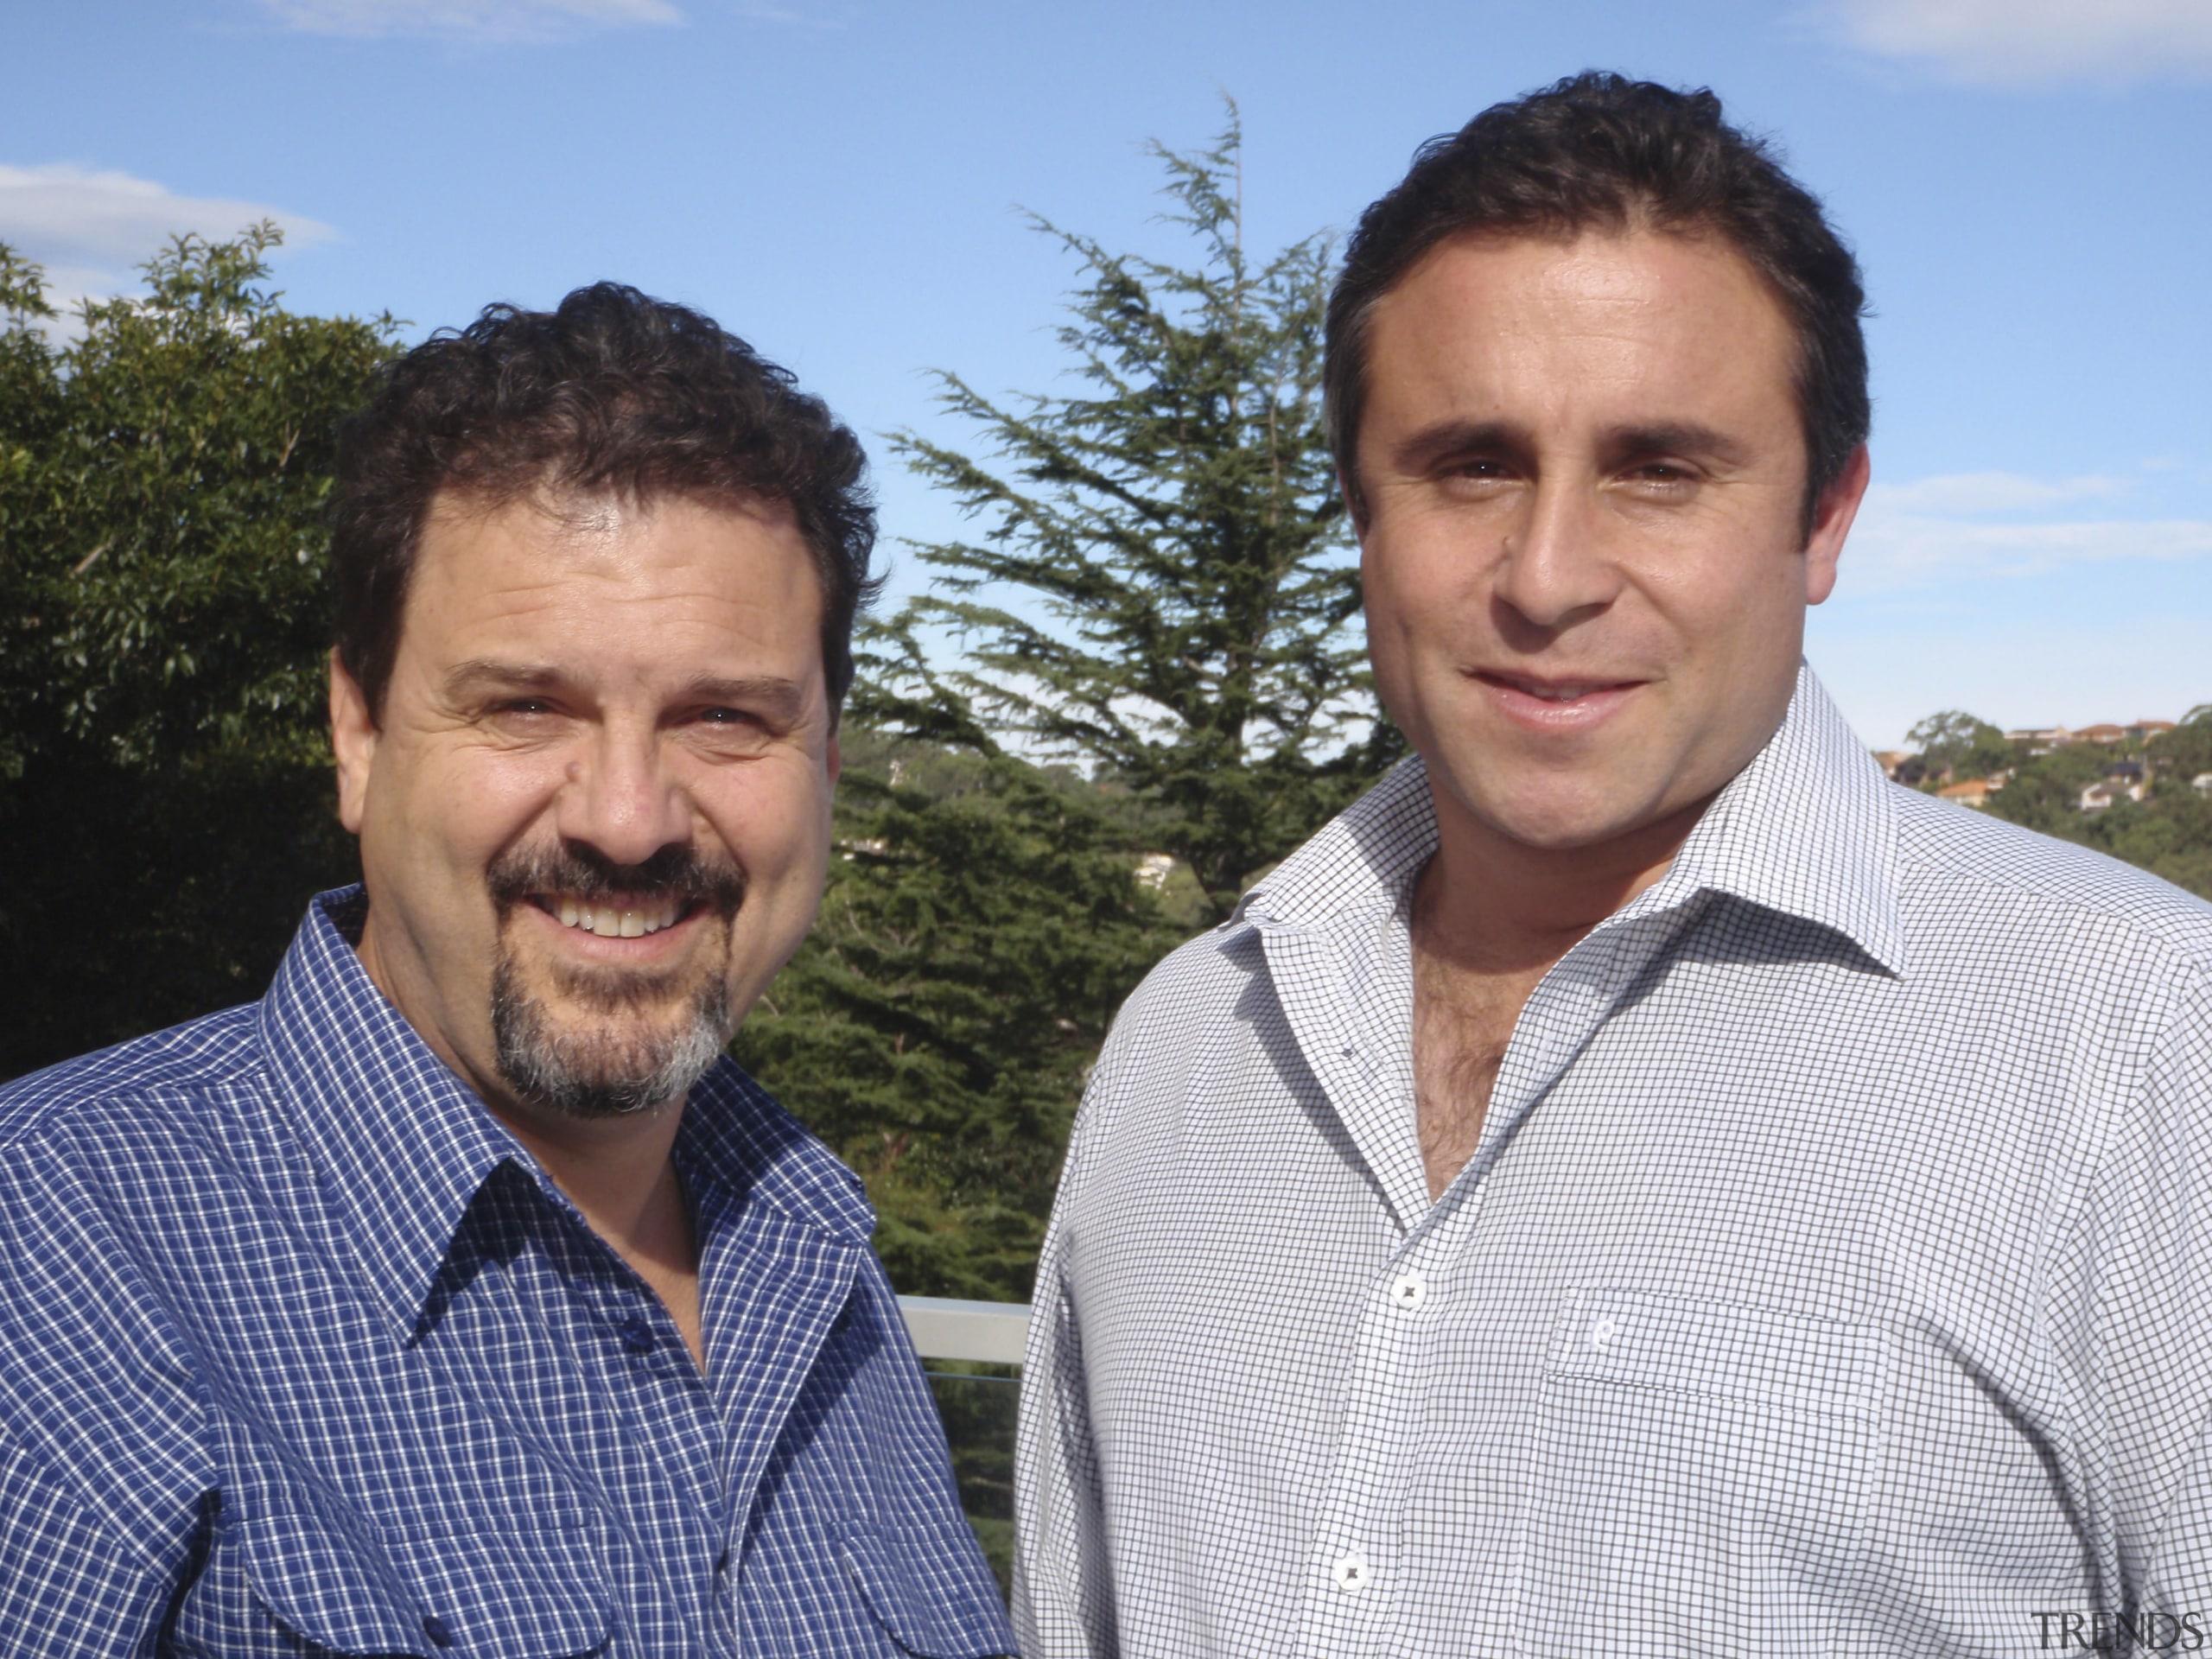 Nino Sanzari and Jon Vithoulka are Managing Directors grass, male, man, person, plant, professional, tree